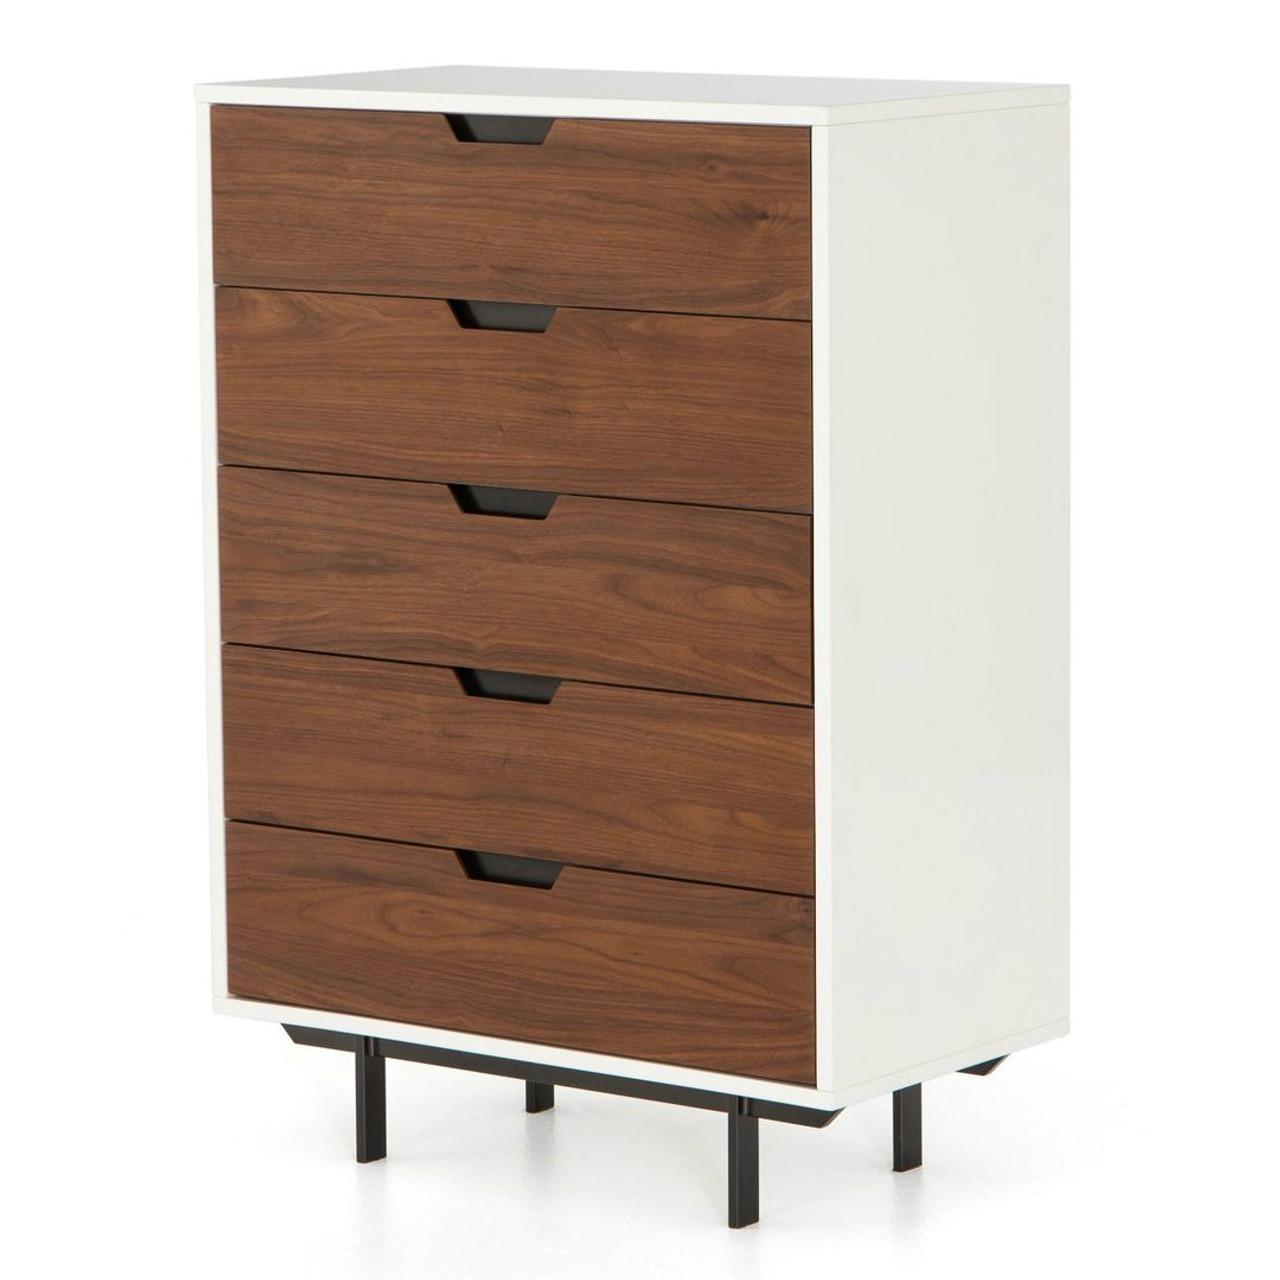 Tucker walnut wood white lacquer 5 drawer dresser